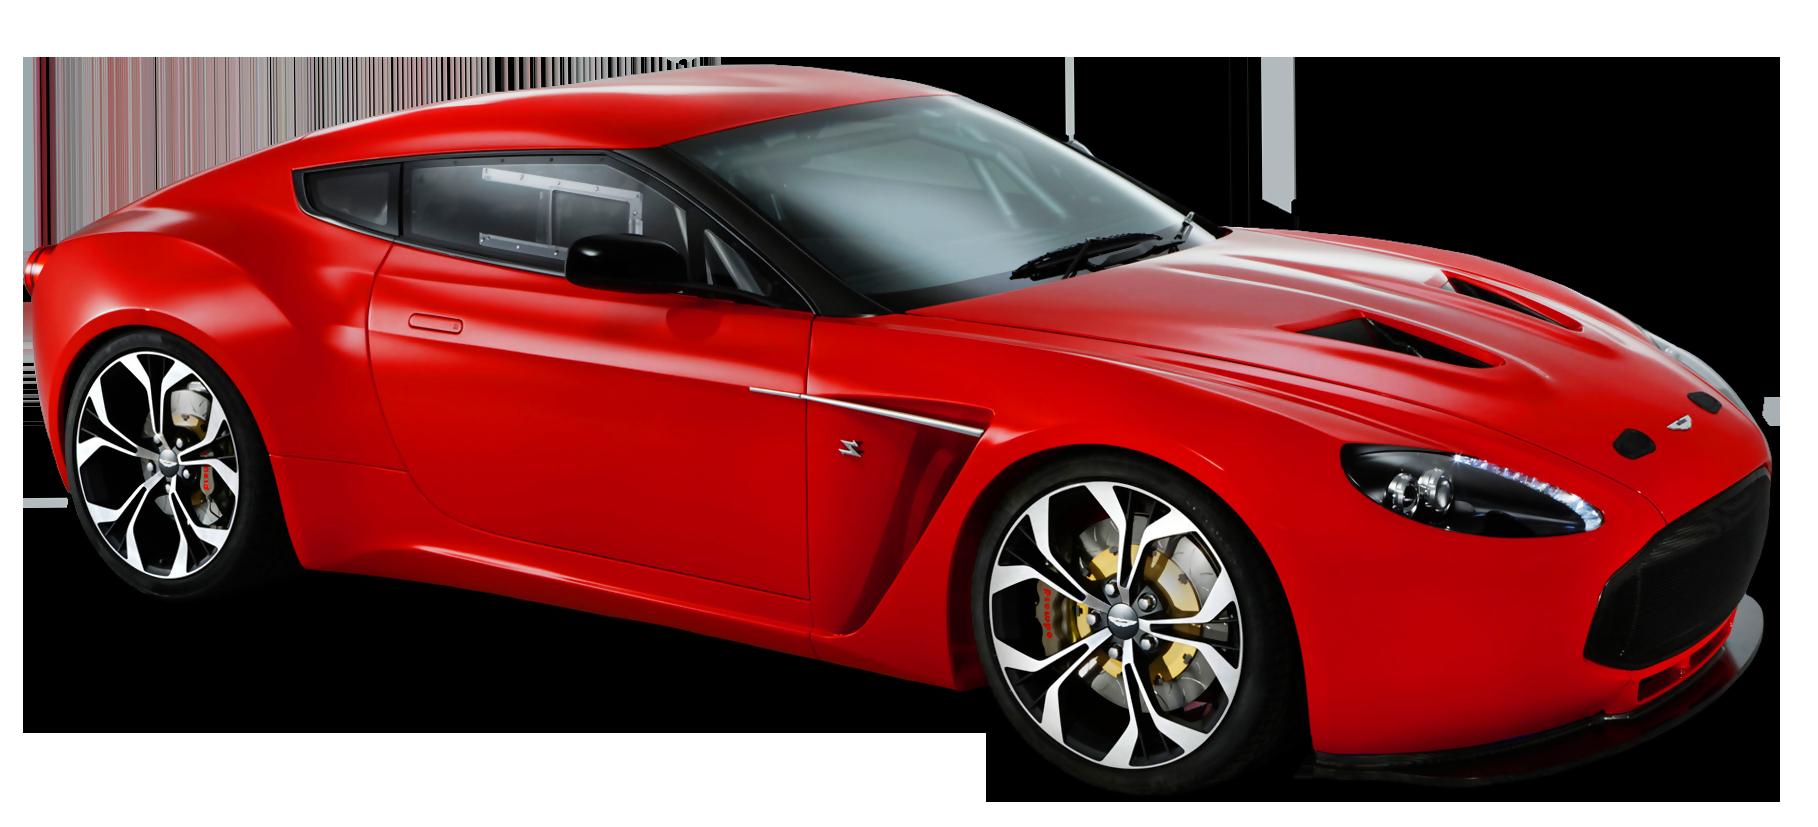 Aston Martin Car PNG Car Clipart.